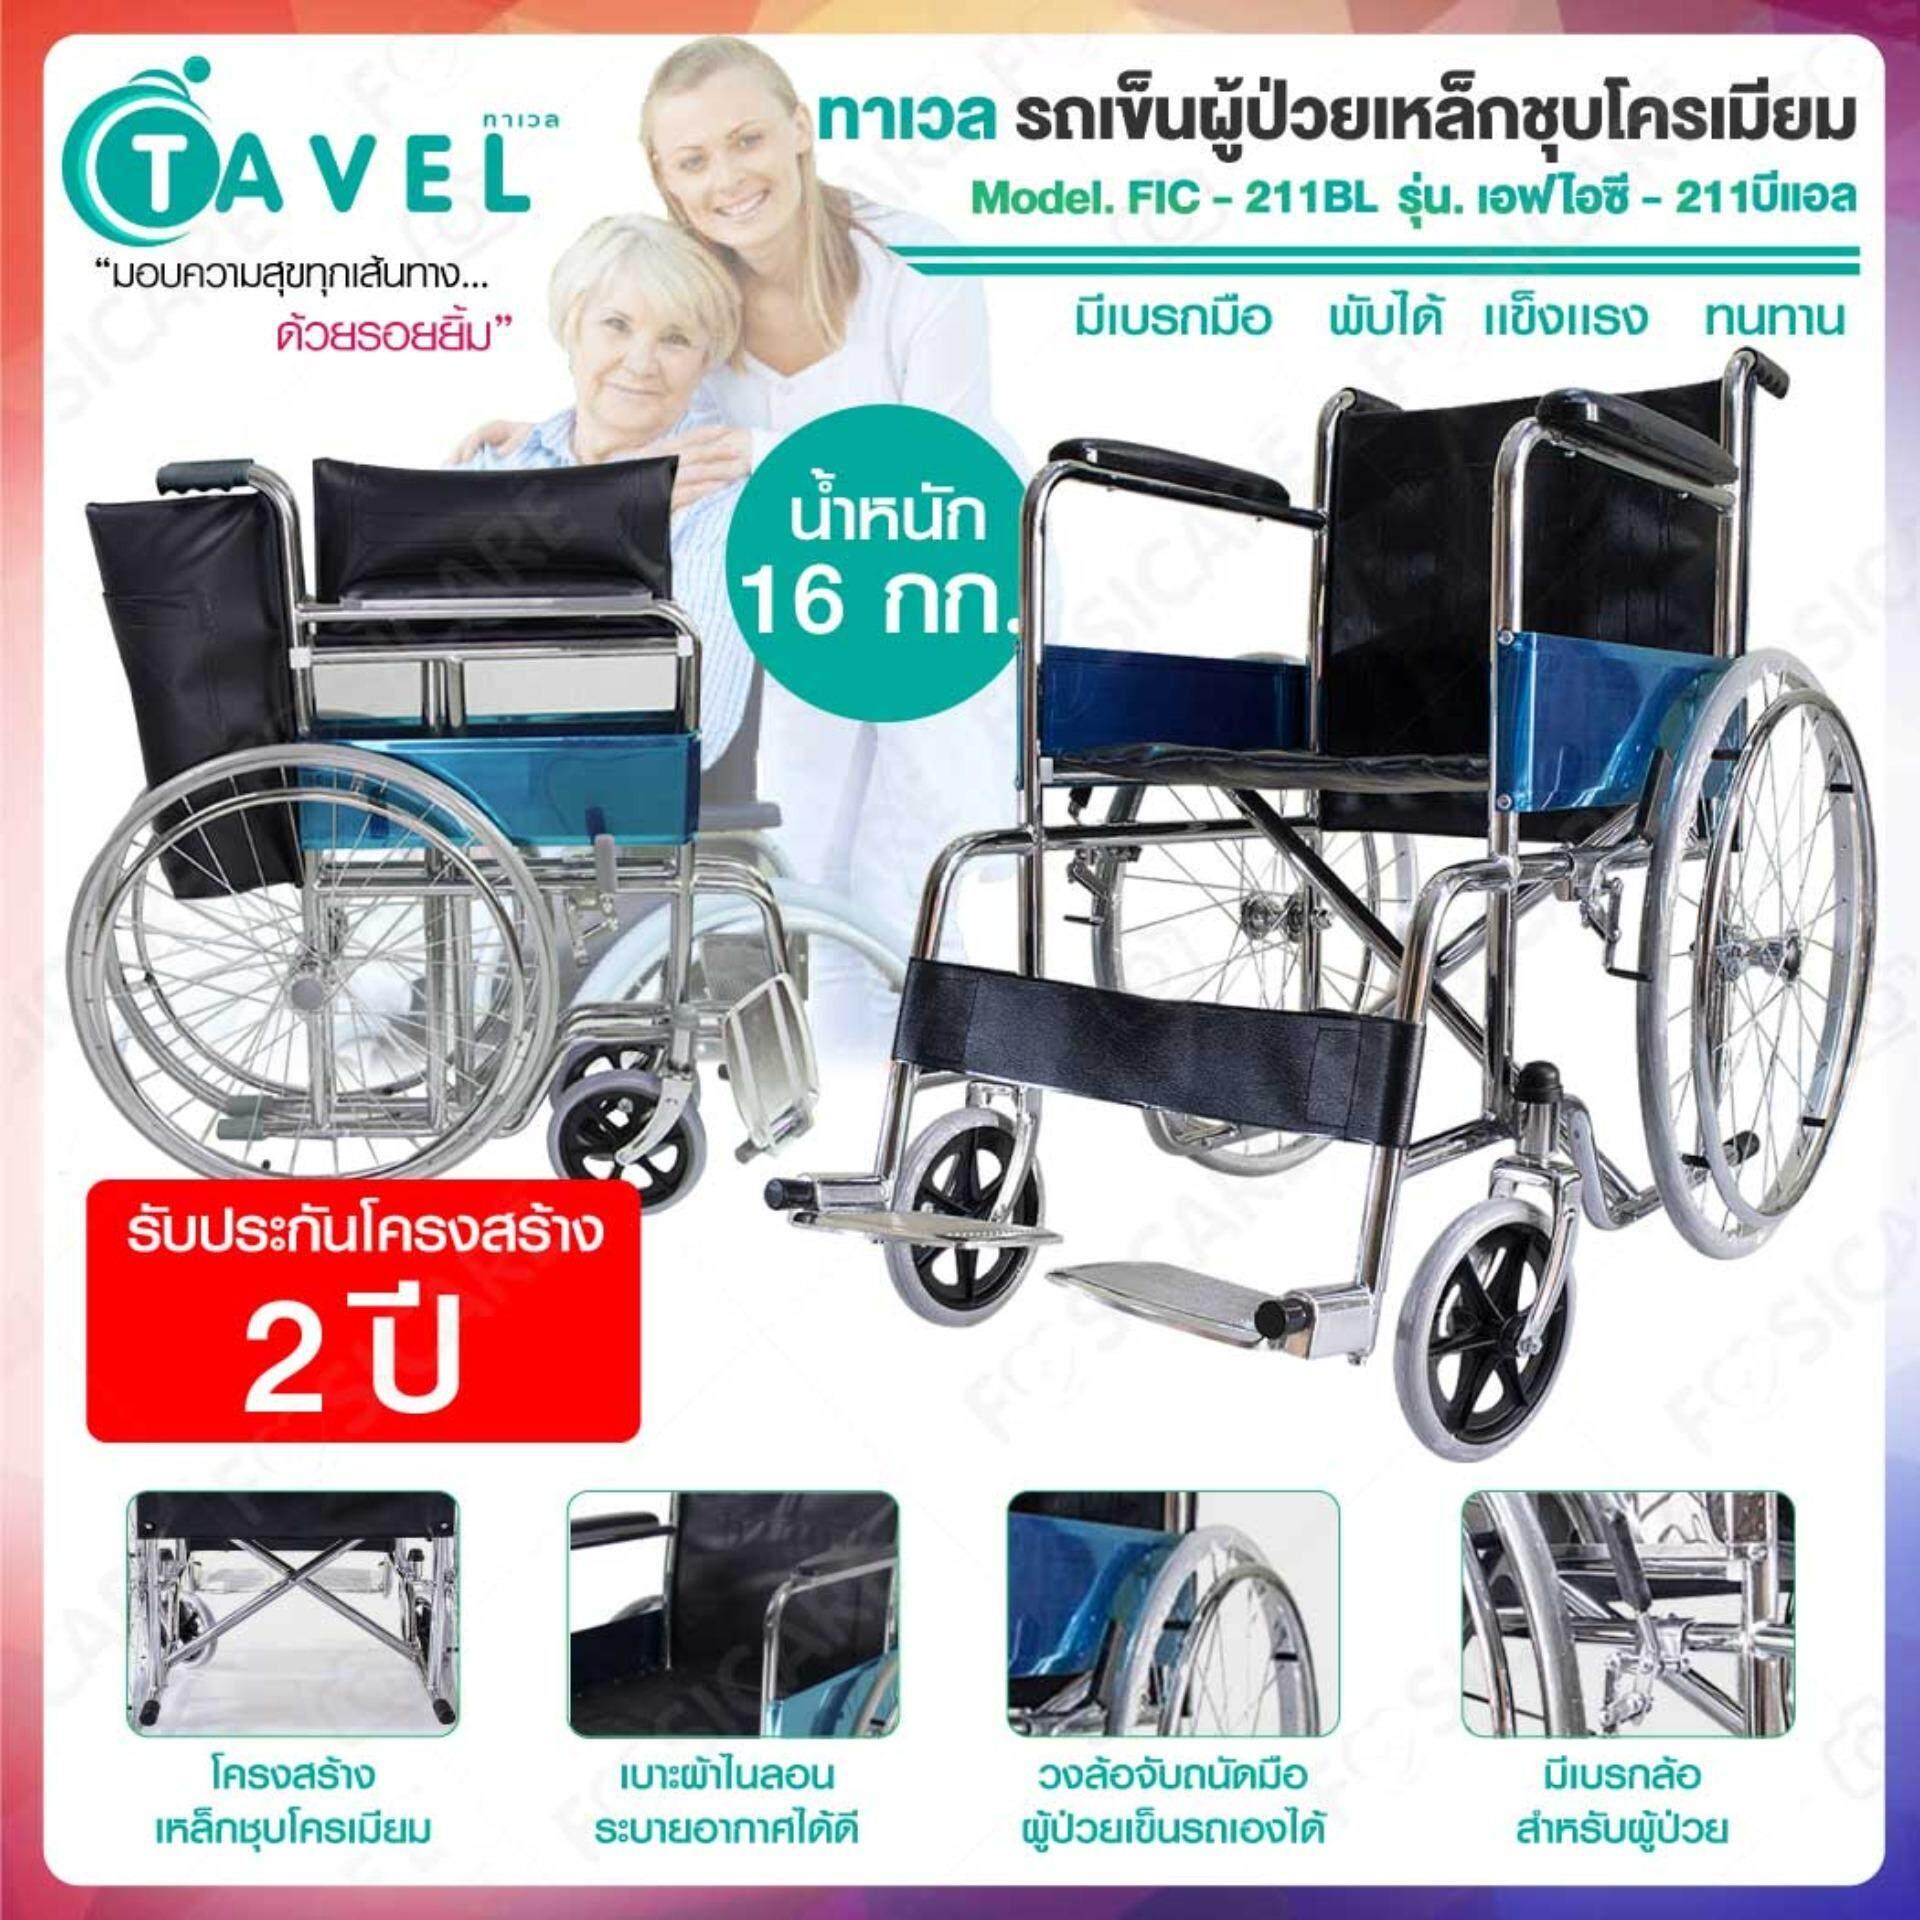 Pantip รีวิว ขอแนะนำ ซื้อ TAVEL ทาเวล รุ่น FIC-211BL  รถเข็นผู้ป่วยเหล็กชุบโครเมียม